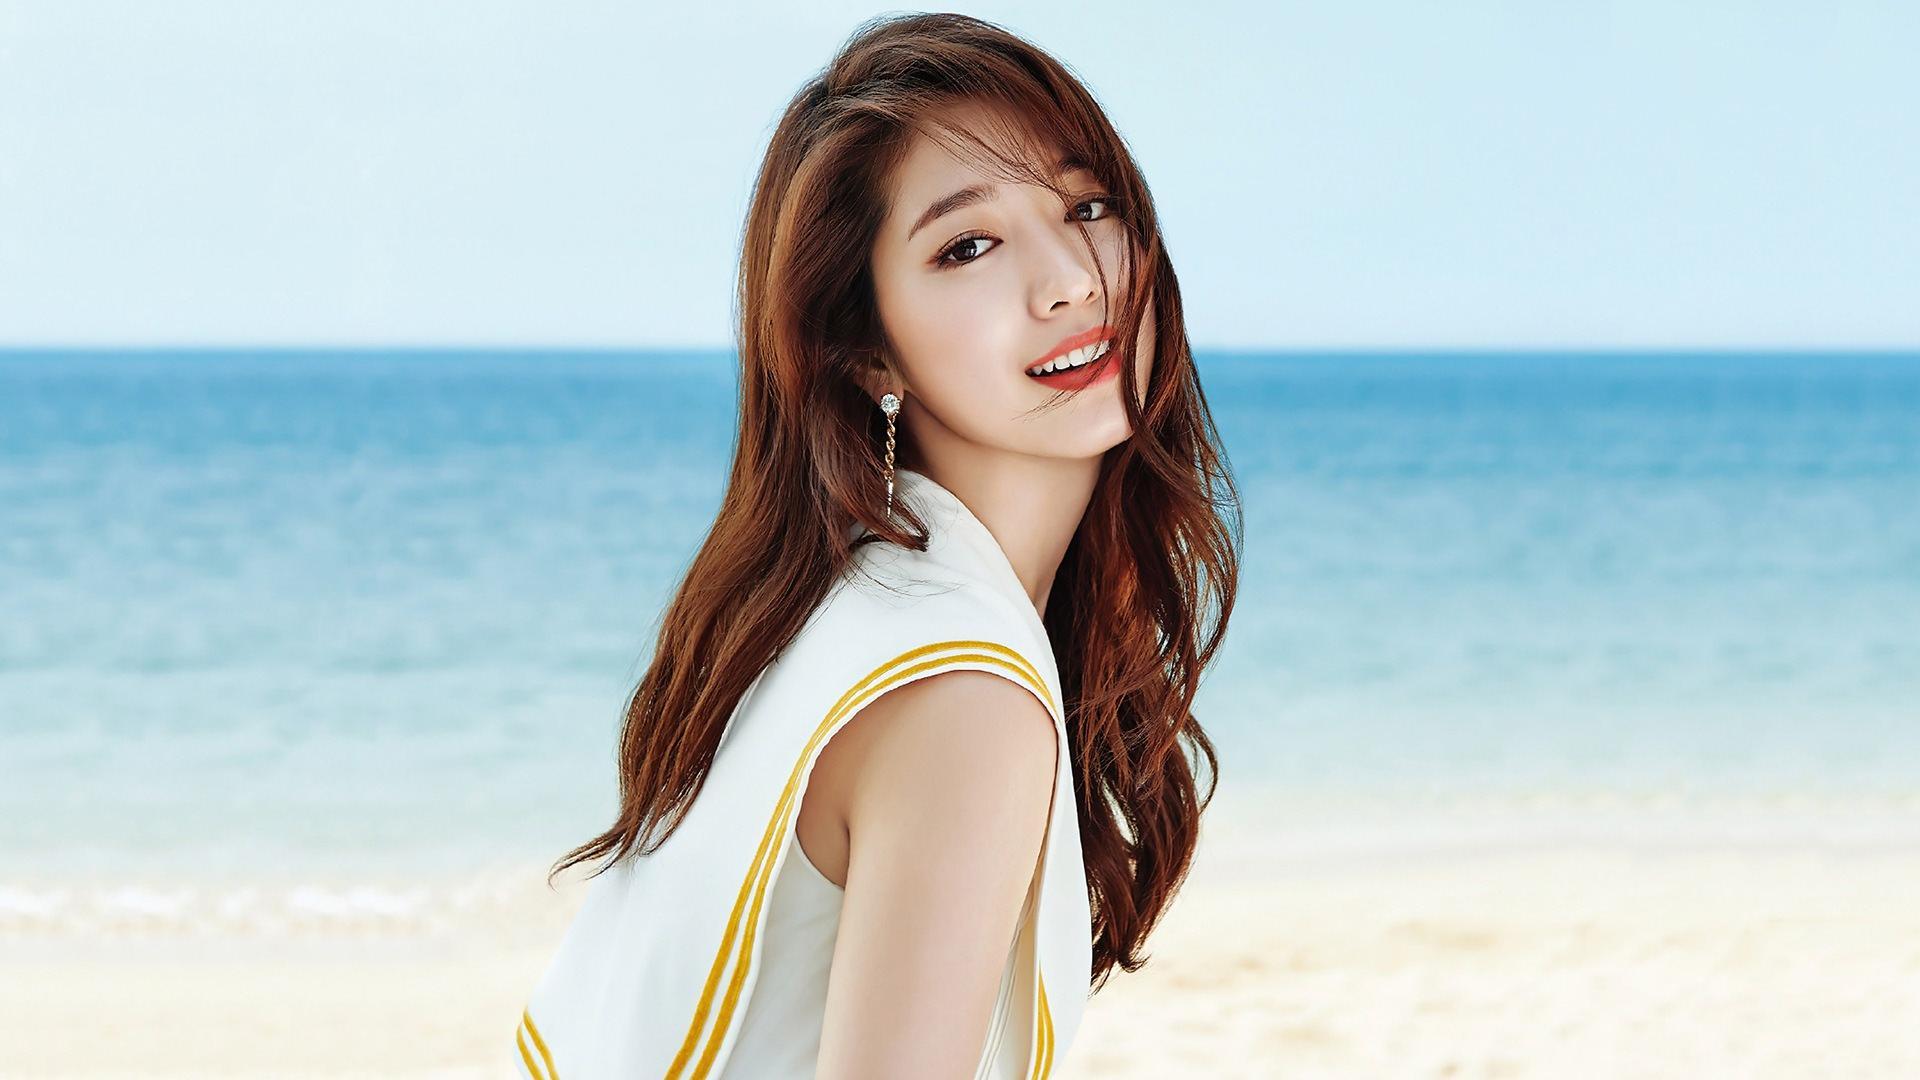 korean girl wallpapers - top free korean girl backgrounds